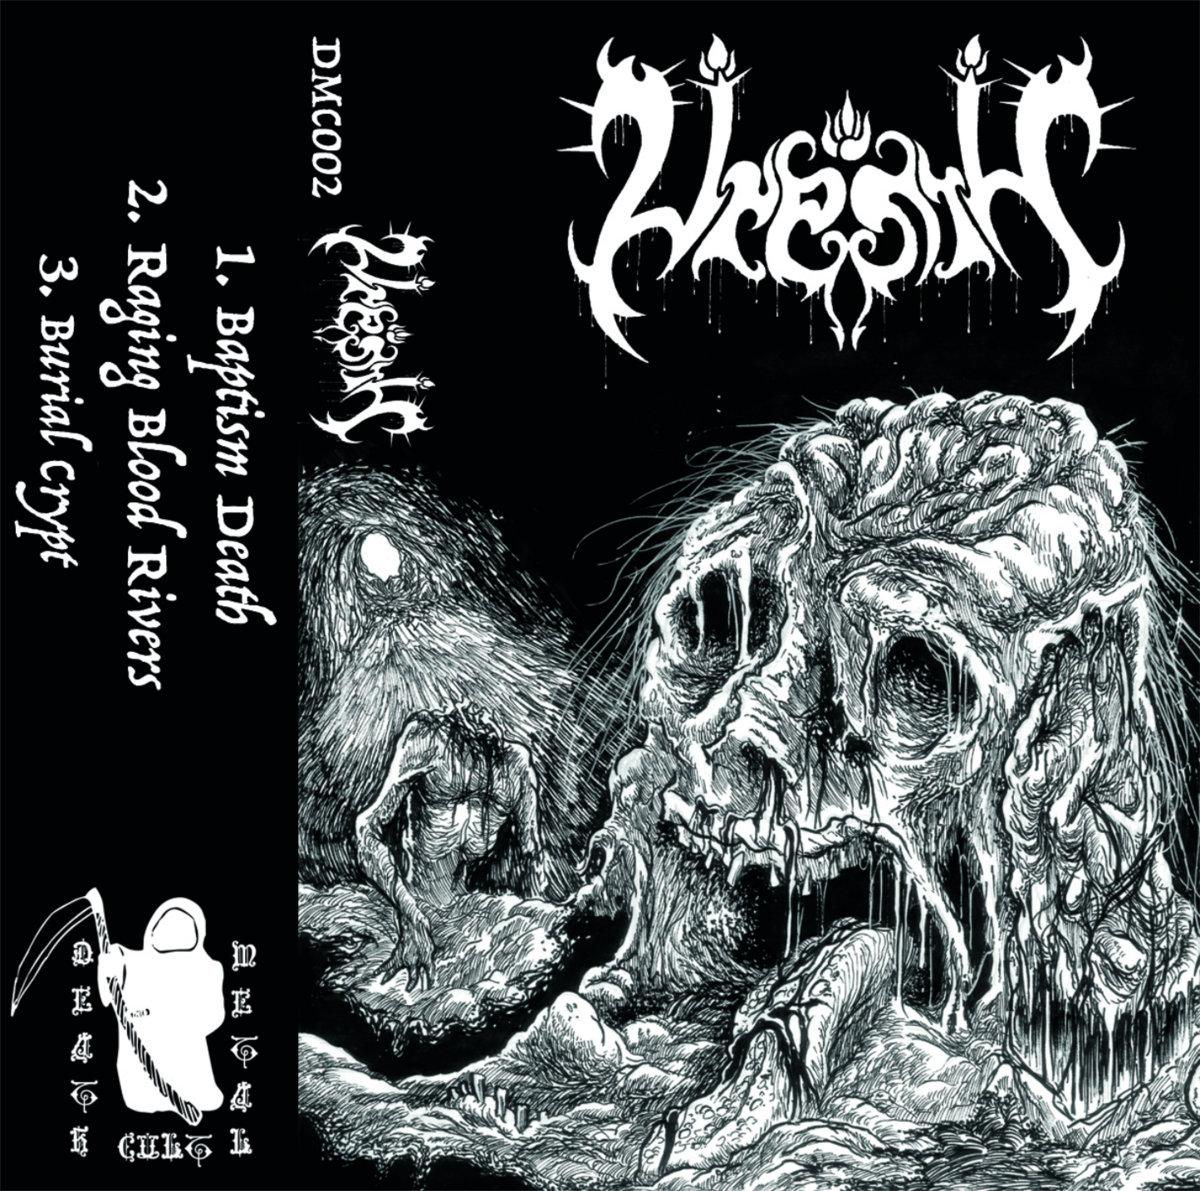 vrenth – demo #1 [demo]